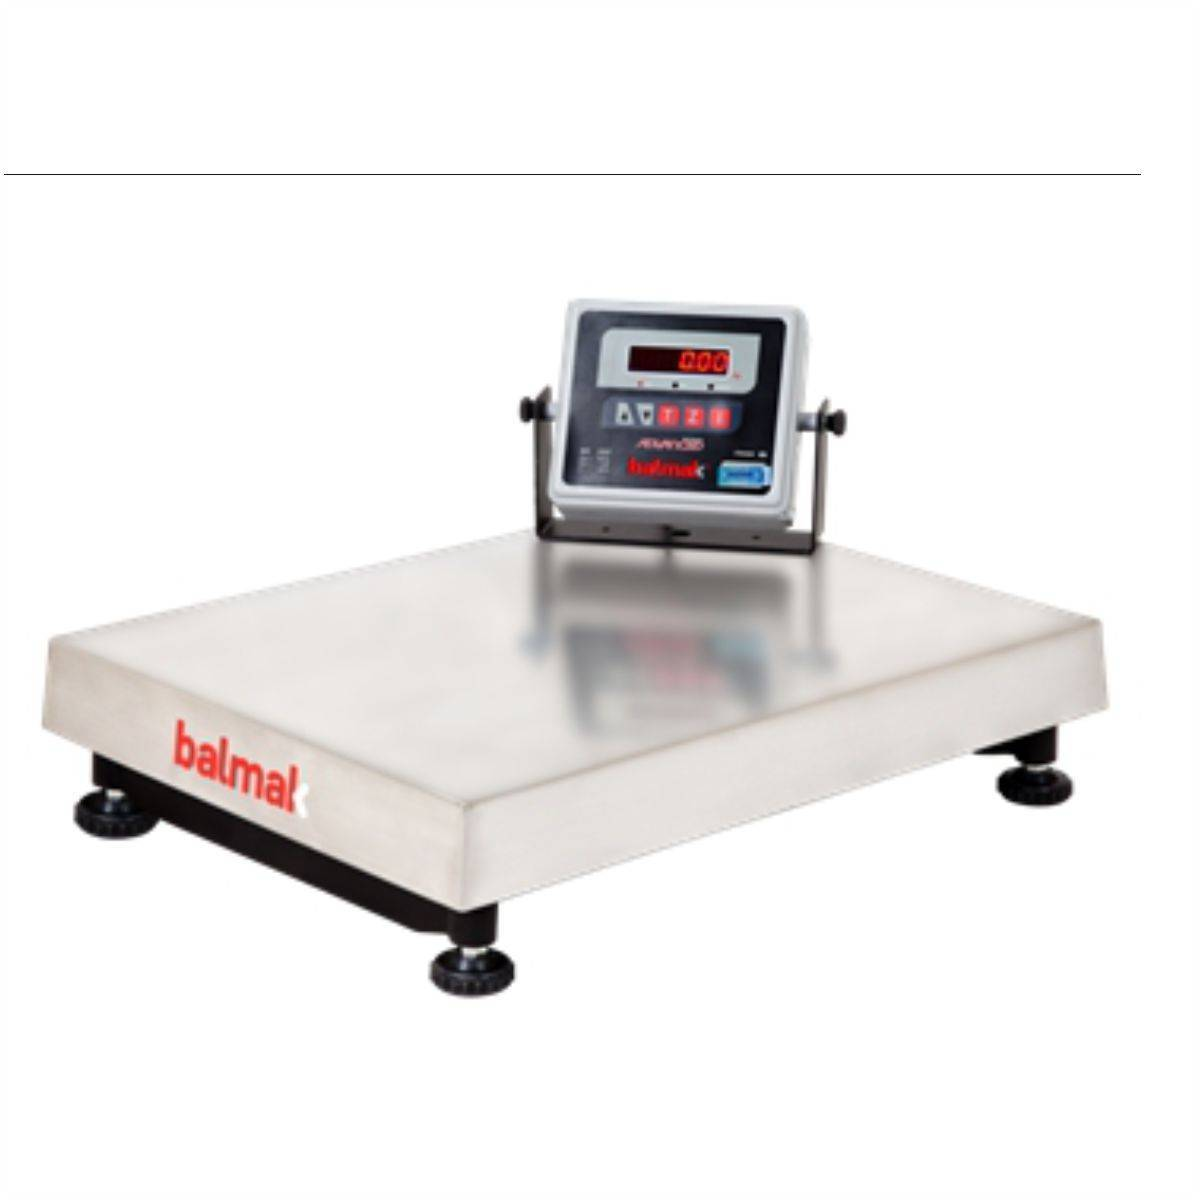 Balança Industrial Eletrônica 300Kg Inox BK-300I1B Balmak  - Magazine do Chef